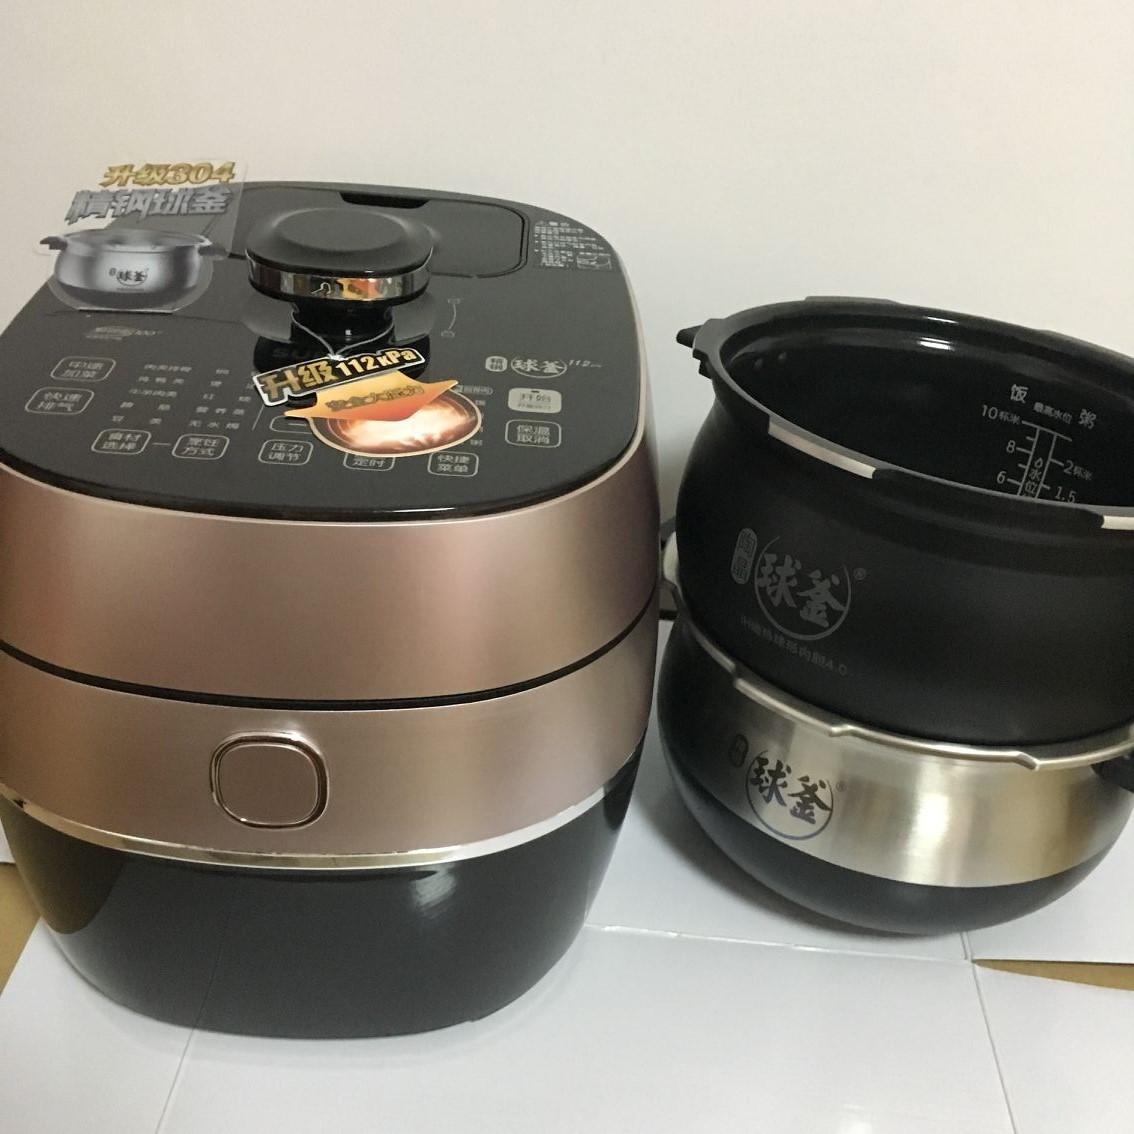 SUPOR/苏泊尔 CYSB50FH19Q-150鲜呼吸IH球釜电压力锅5L饭煲高压锅